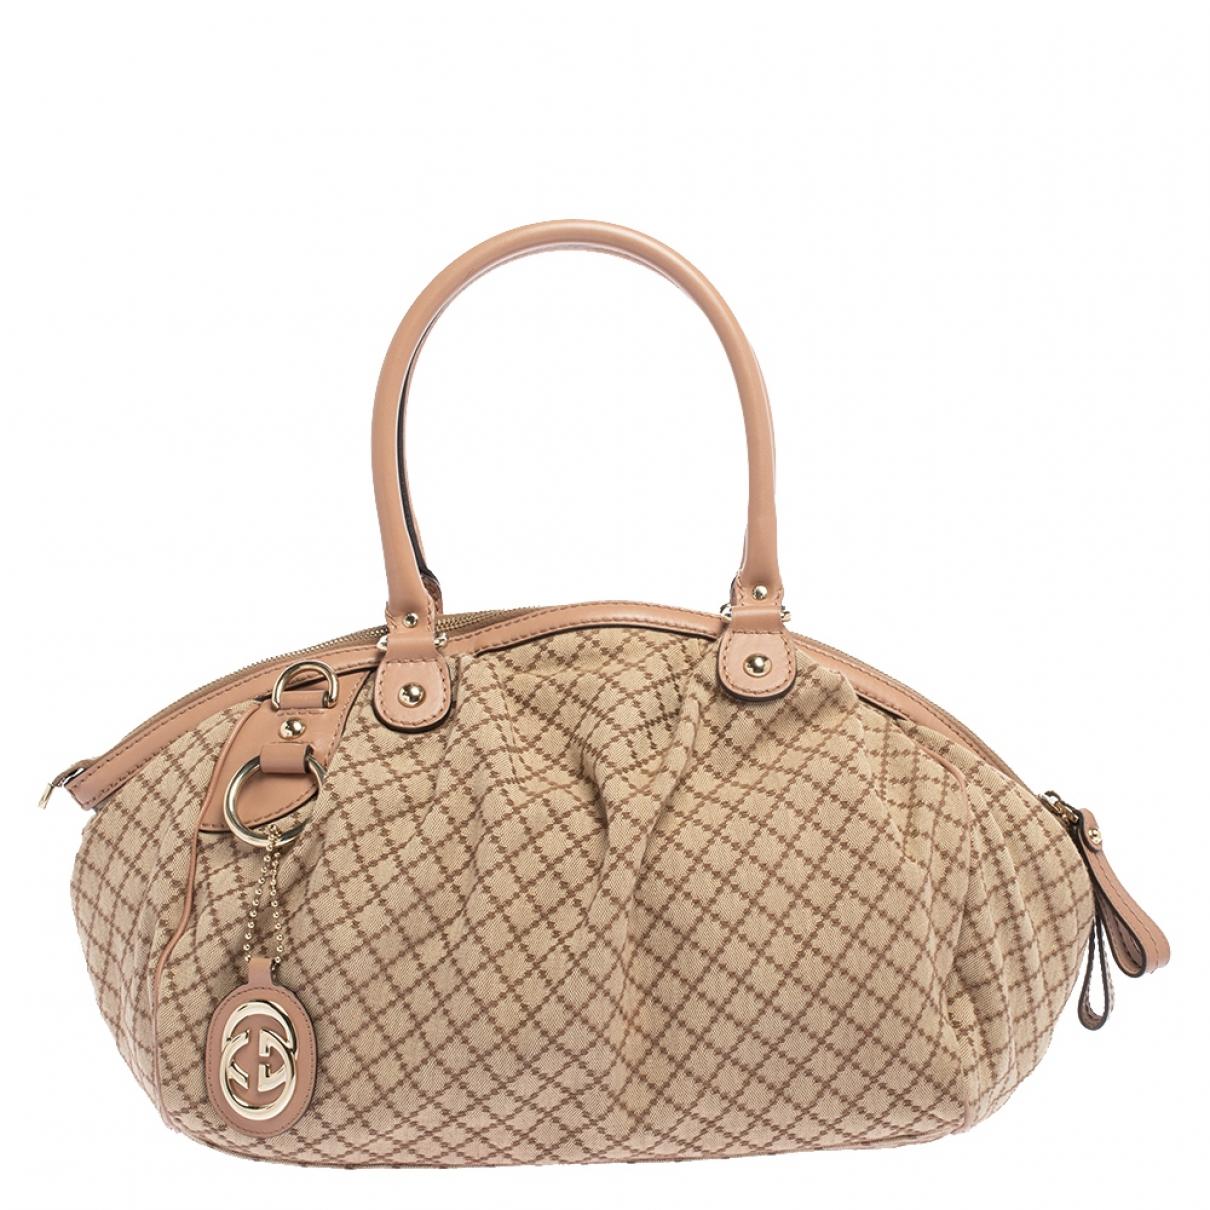 Gucci Sukey Beige Leather handbag for Women N